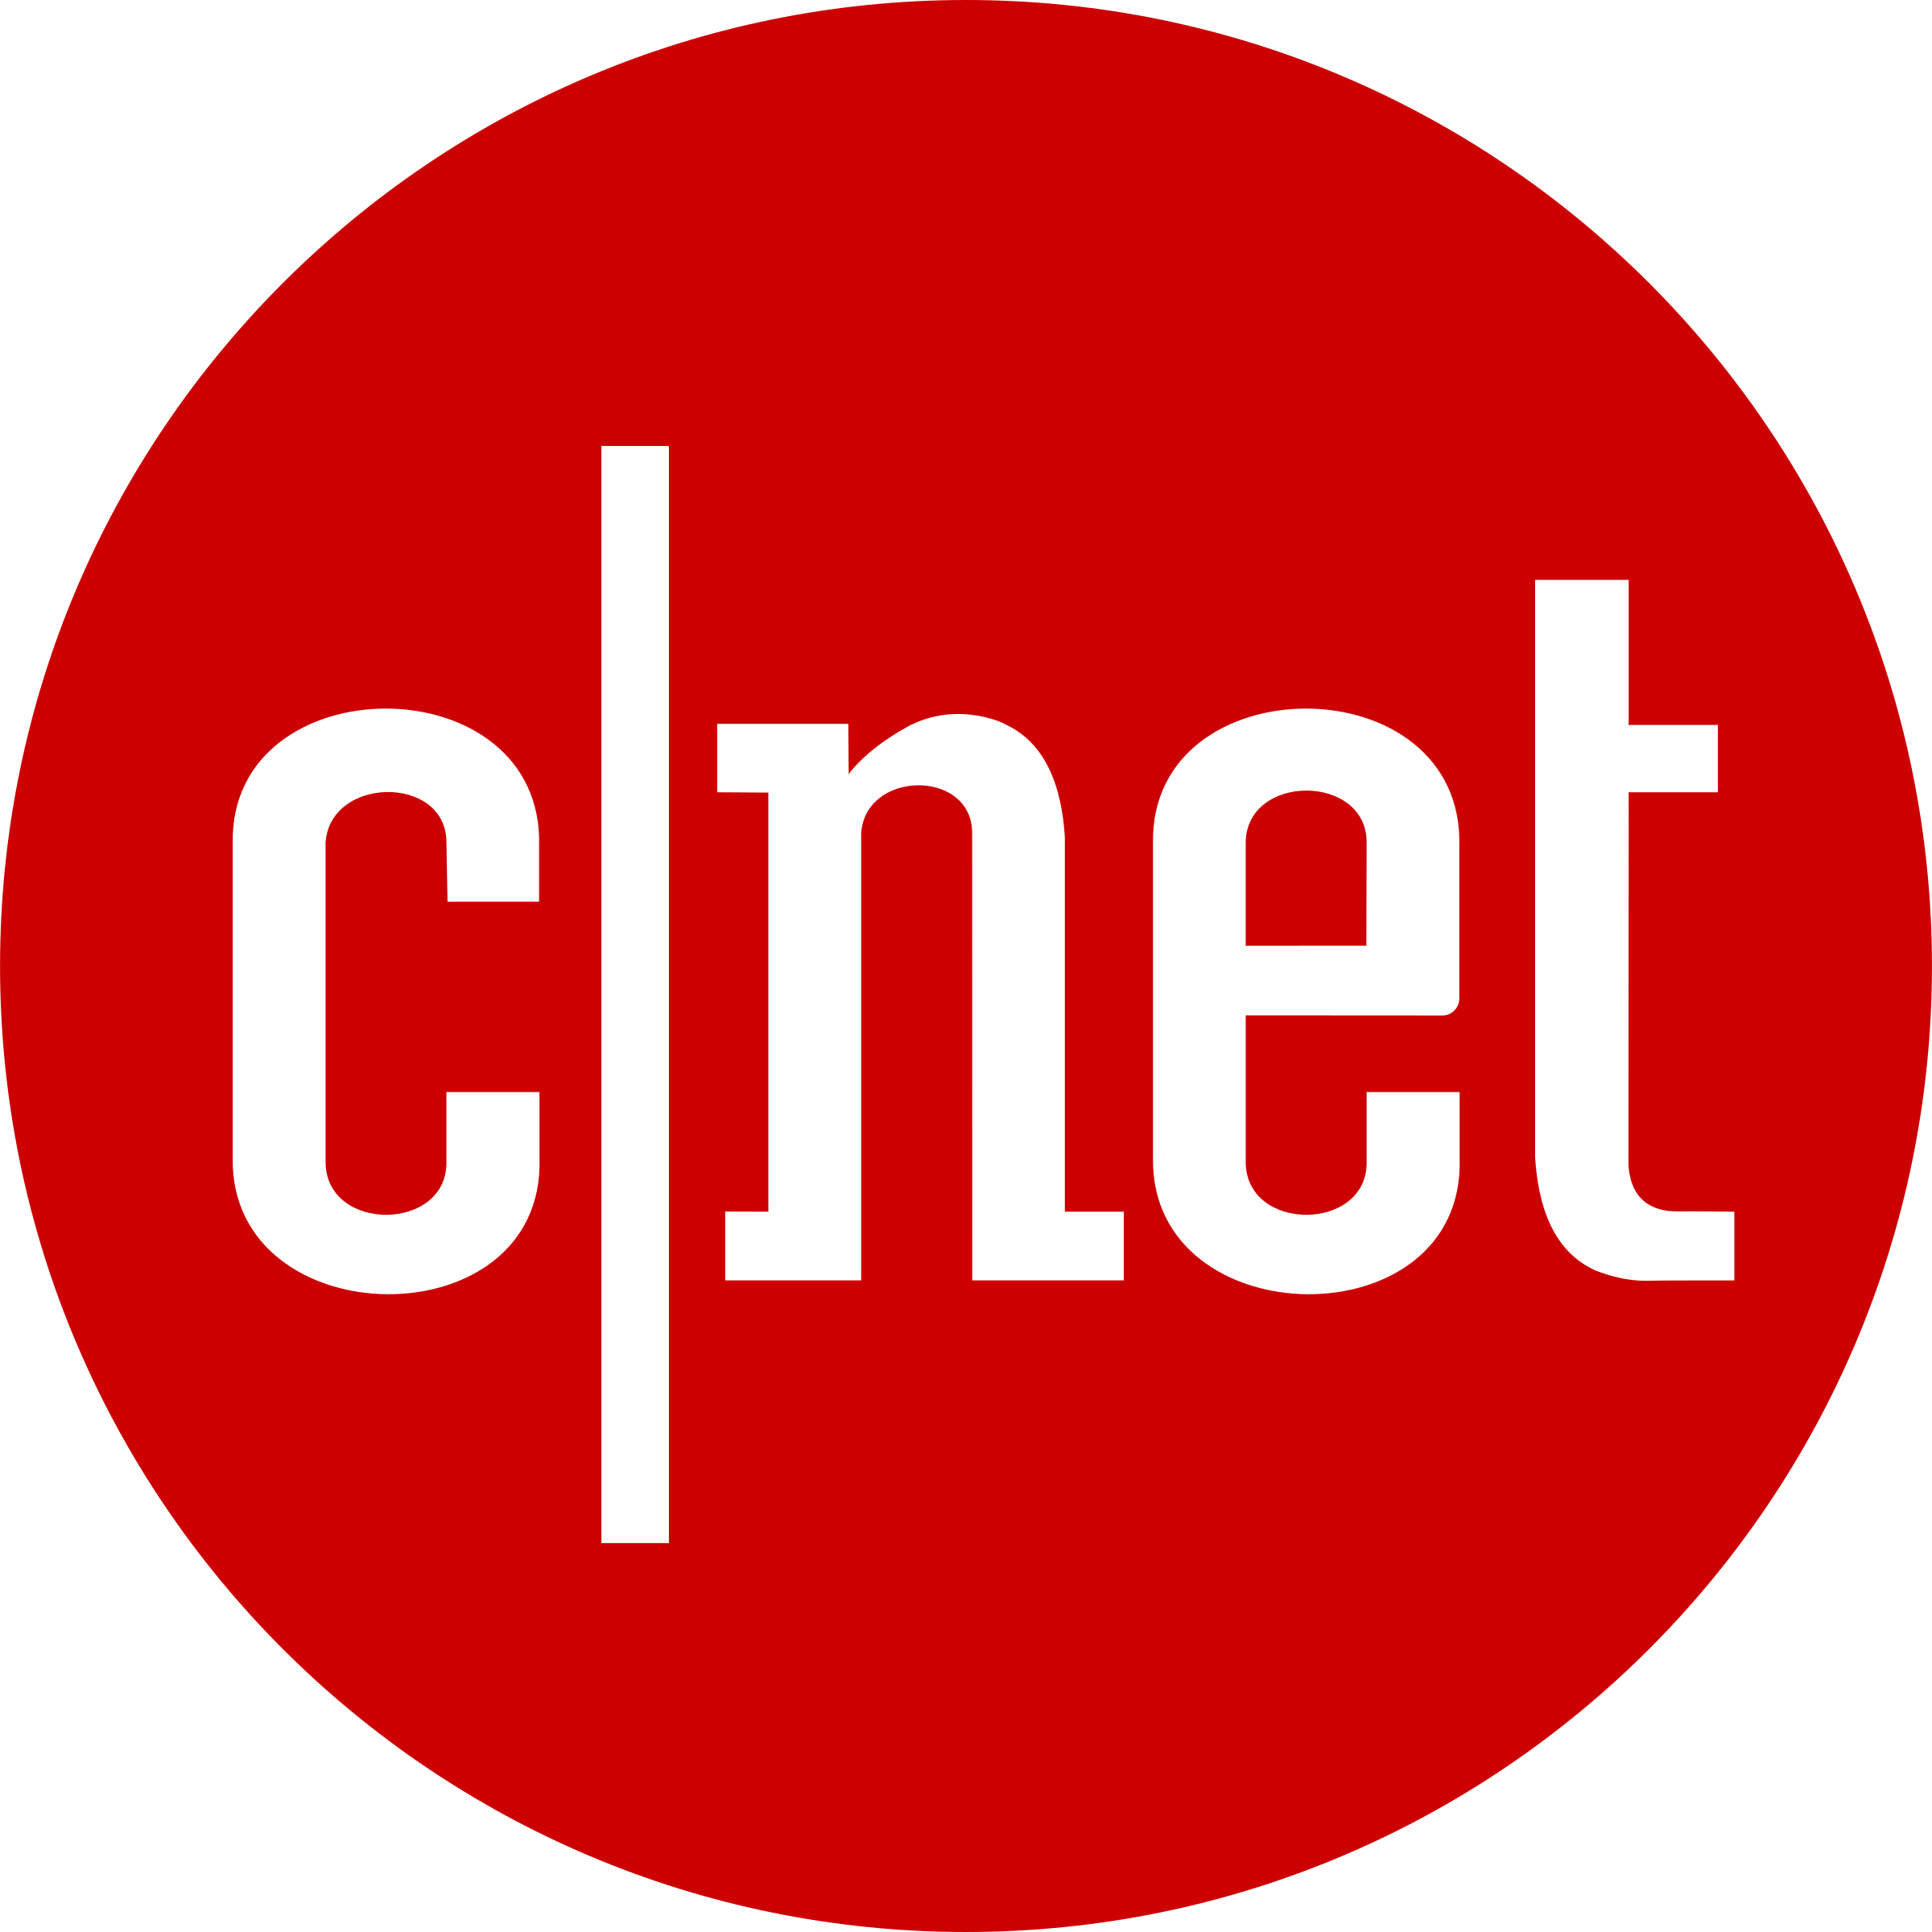 cnet-logo-png-transparent.png